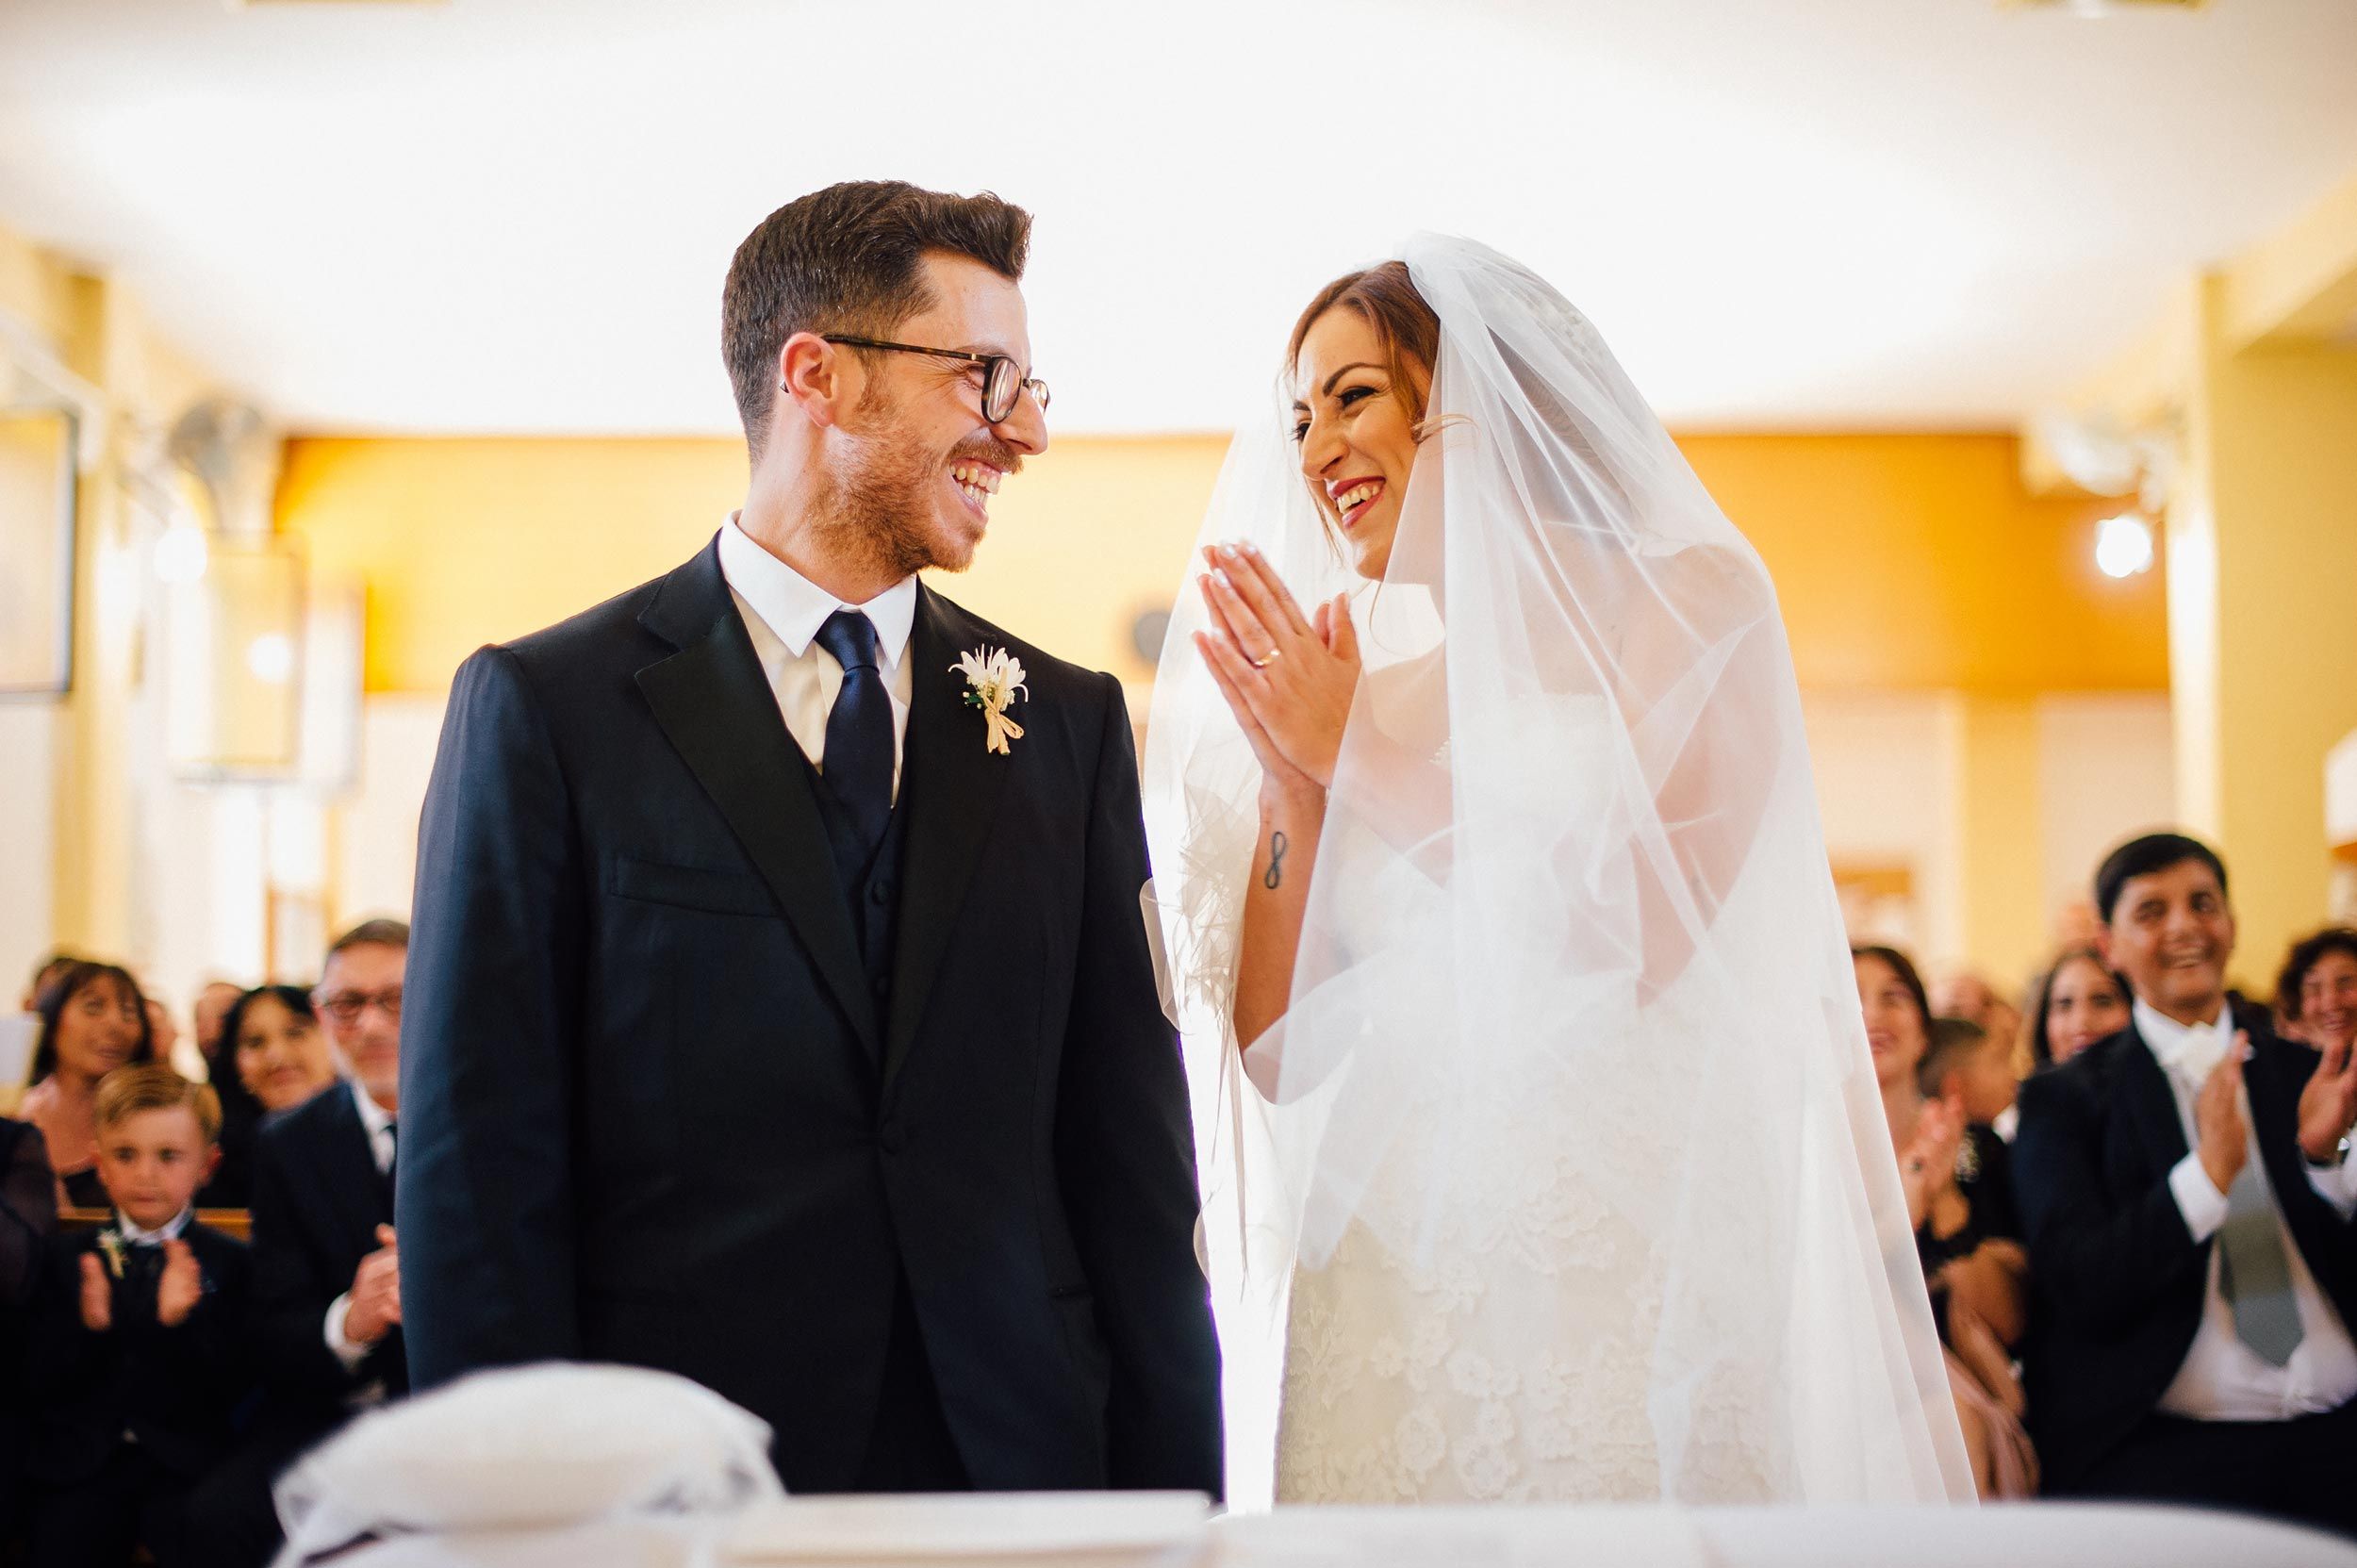 2016-Claudio-Teresa-Naples-Wedding-Photographer-Italy-Alessandro-Avenali-49.jpg